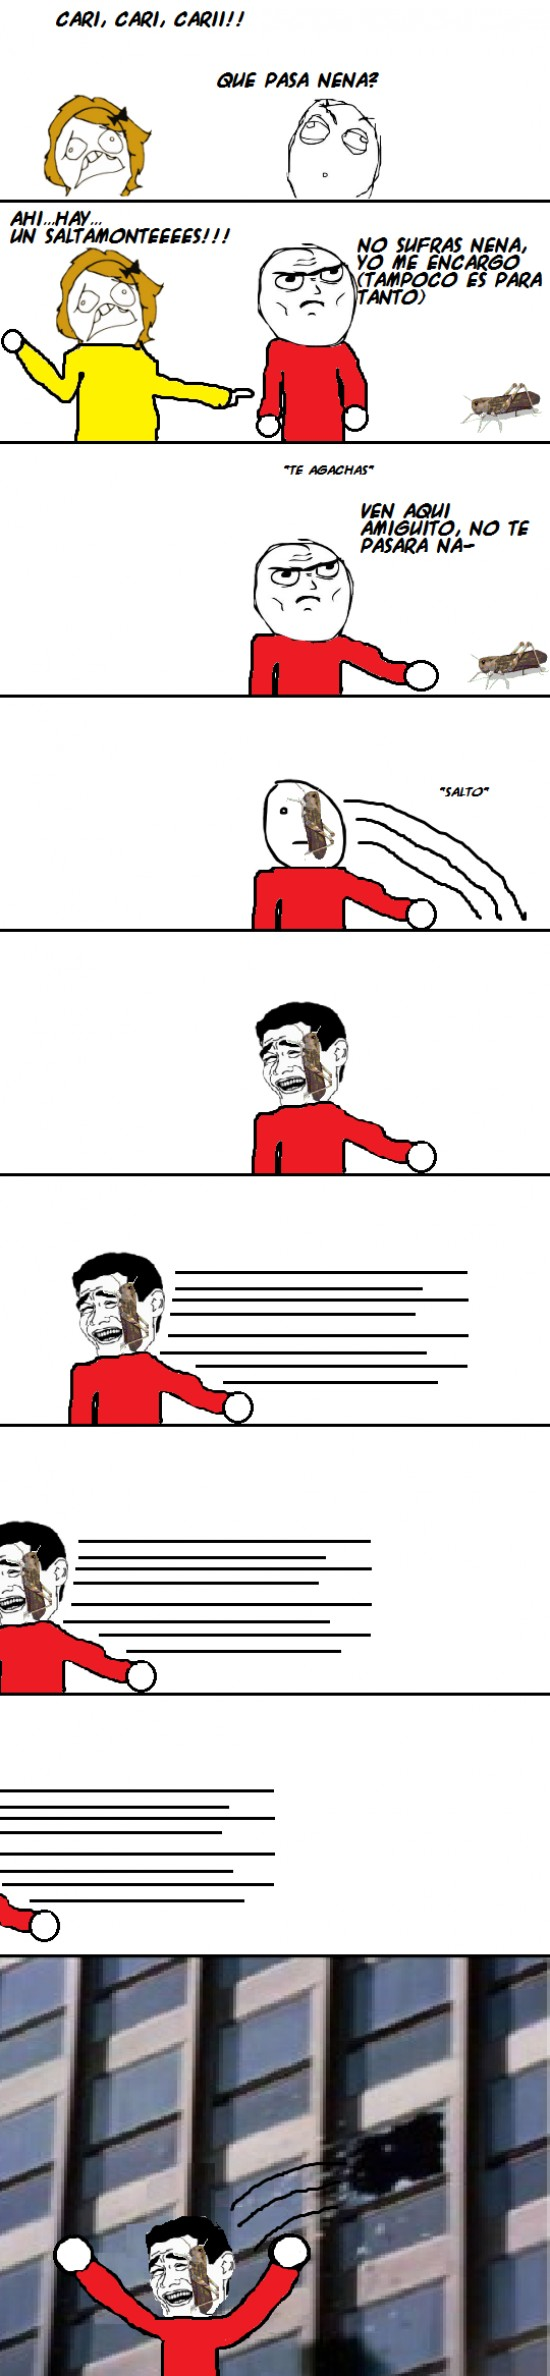 Yao - La peor situacion